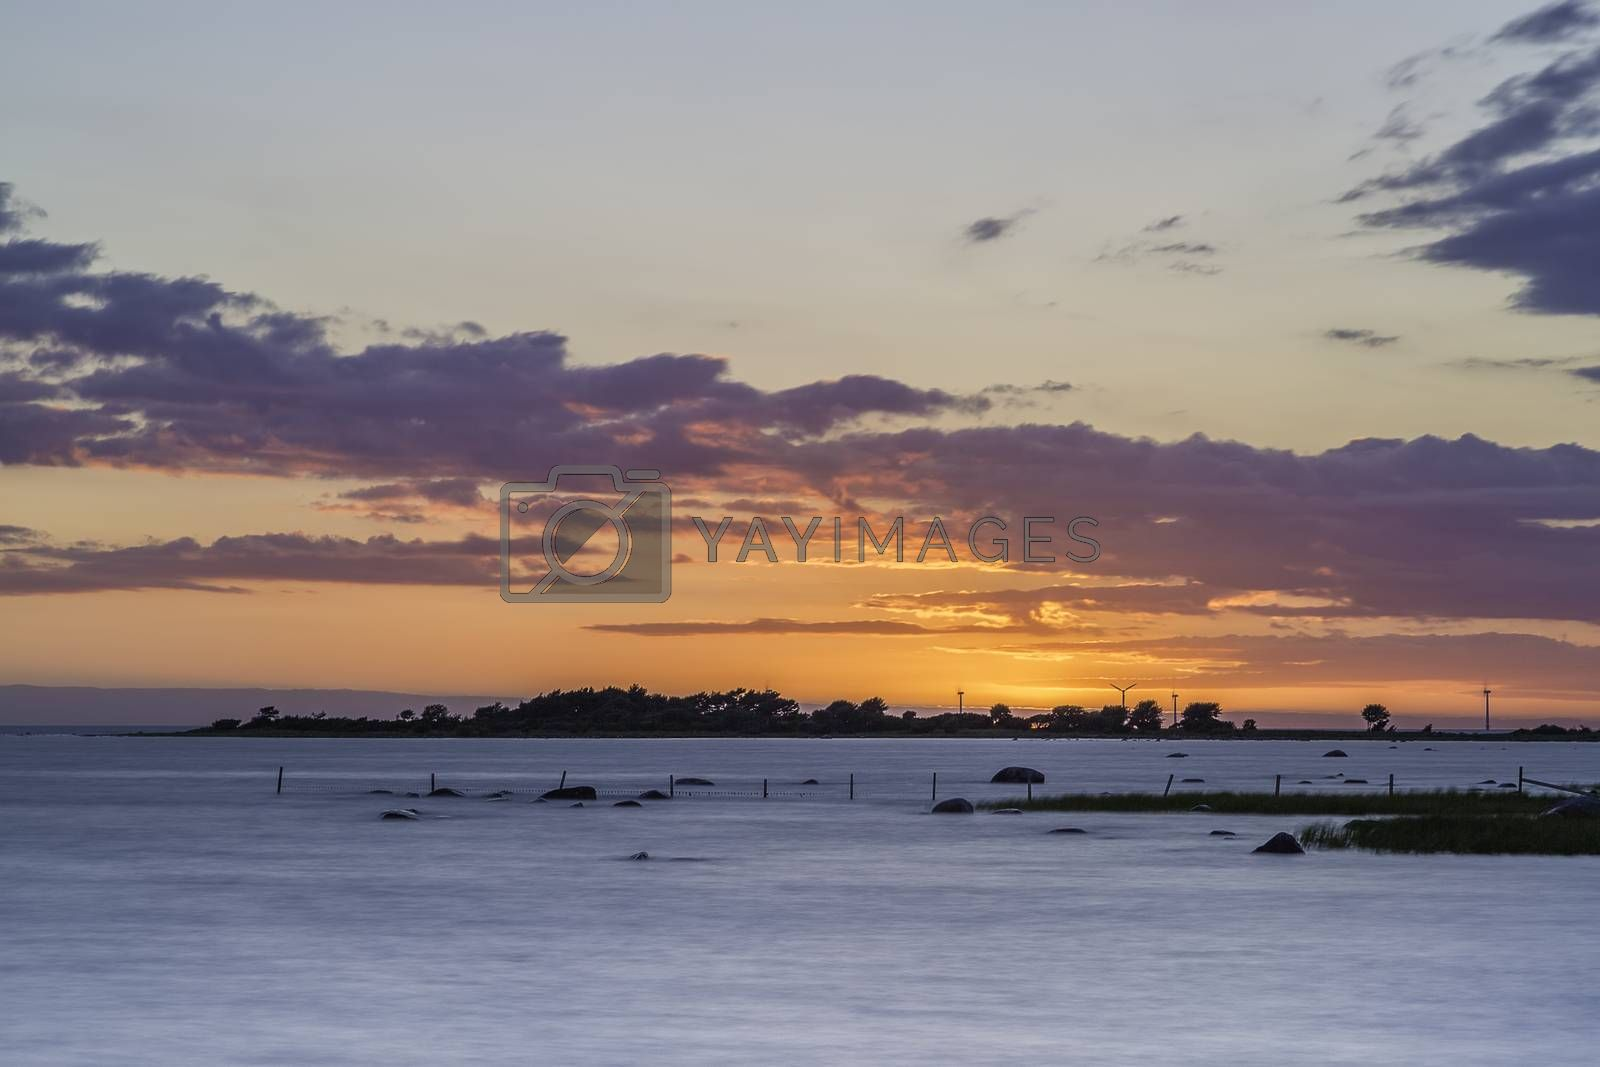 Sunset over Ocean in Gotland, Sweden.